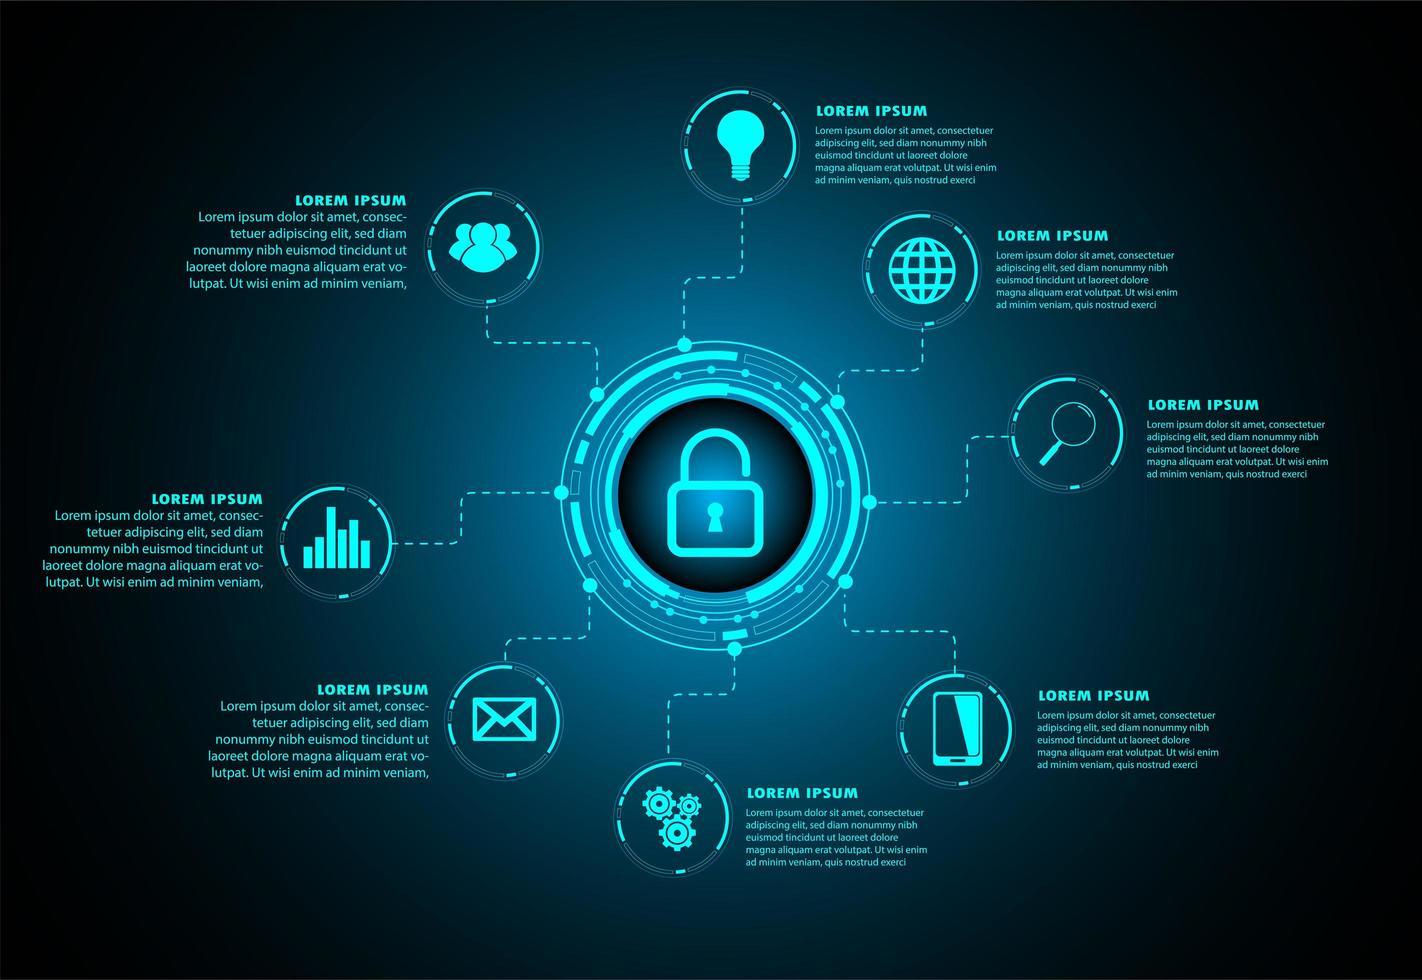 blå hud cybersäkerhet framtida teknologikoncept vektor